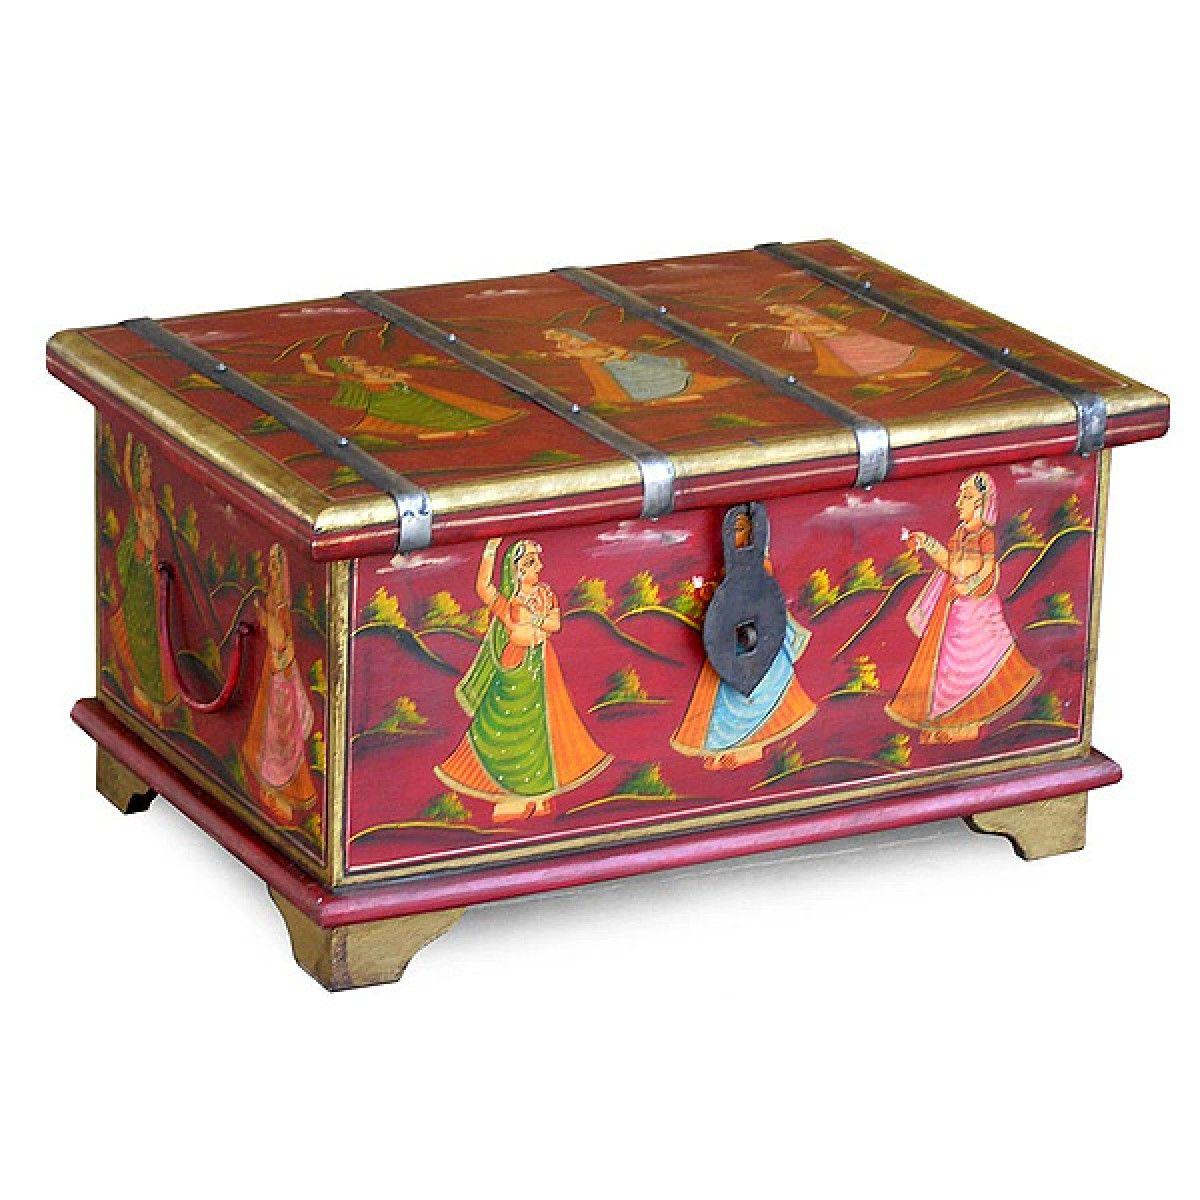 Sweet Indus Rj Painted furniture, Furniture, Indian